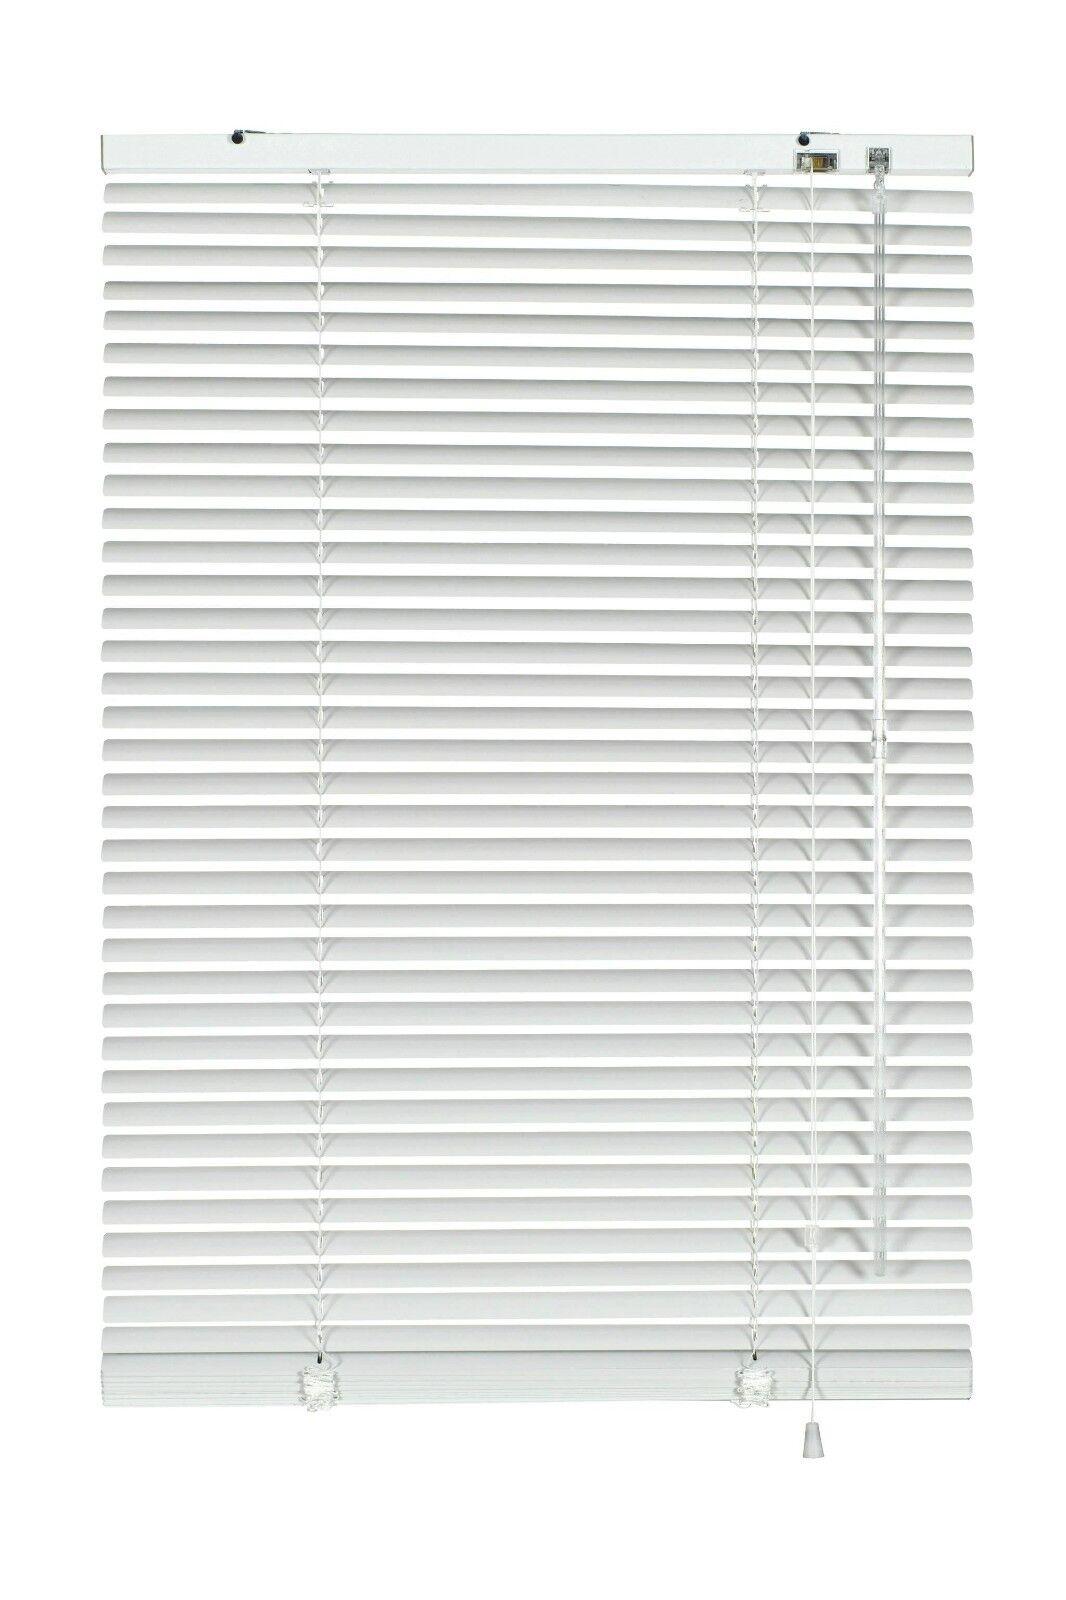 Alu Jalousie Aluminium Jalousette Klemmträger Fenster Rollo Lamelle Weiß Silber